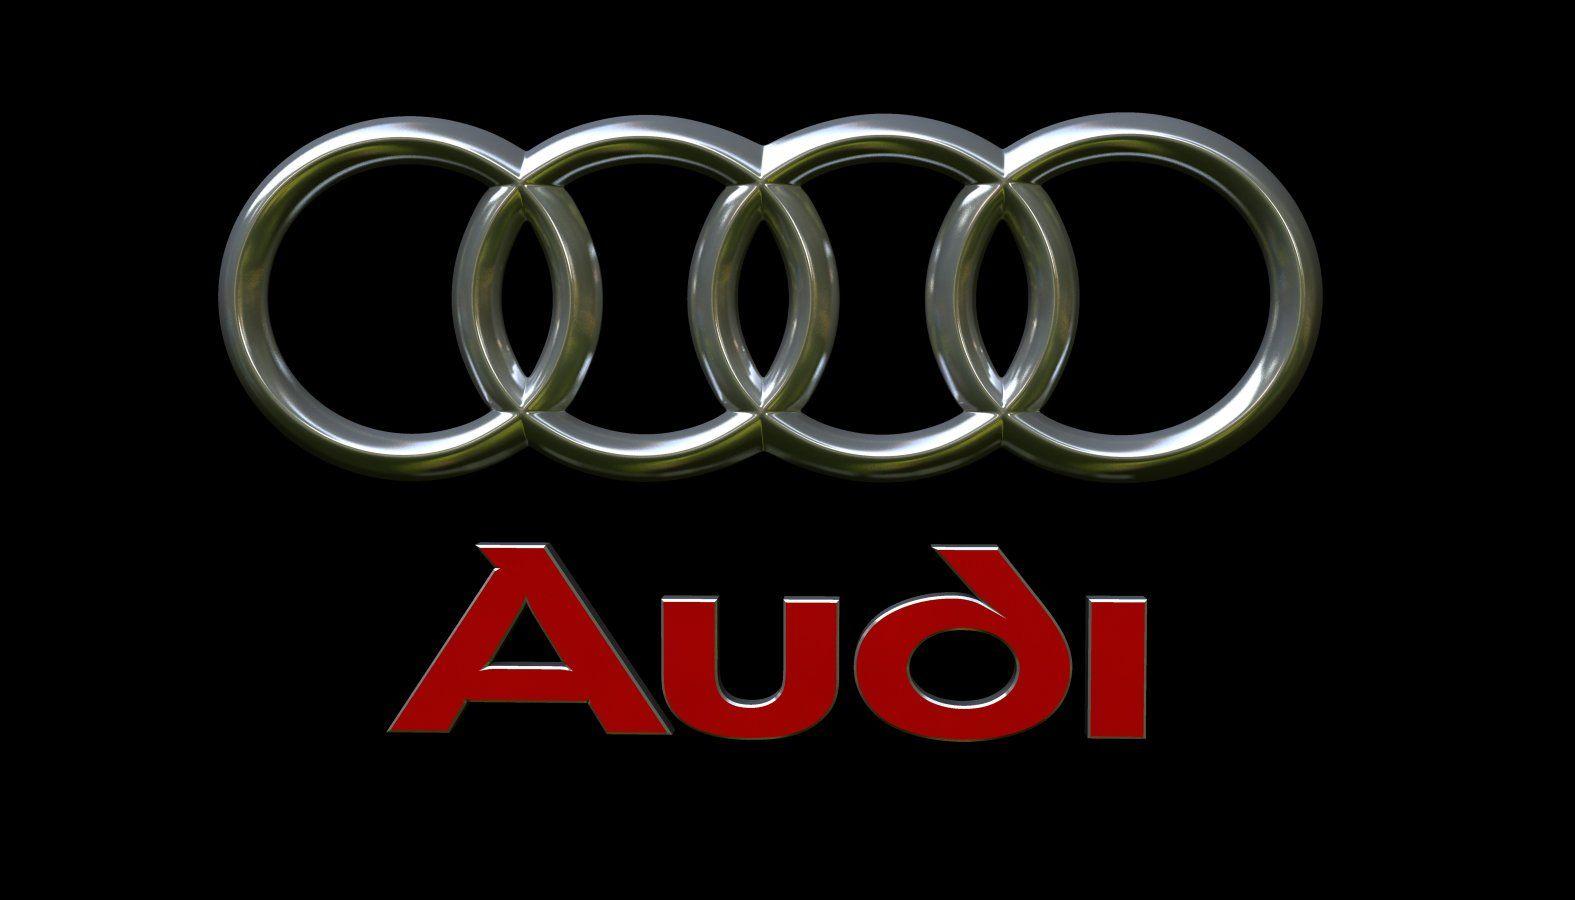 Audi A6 3d Wallpaper You Can Download Audi Black Logo Hd Wallpapers Here Audi